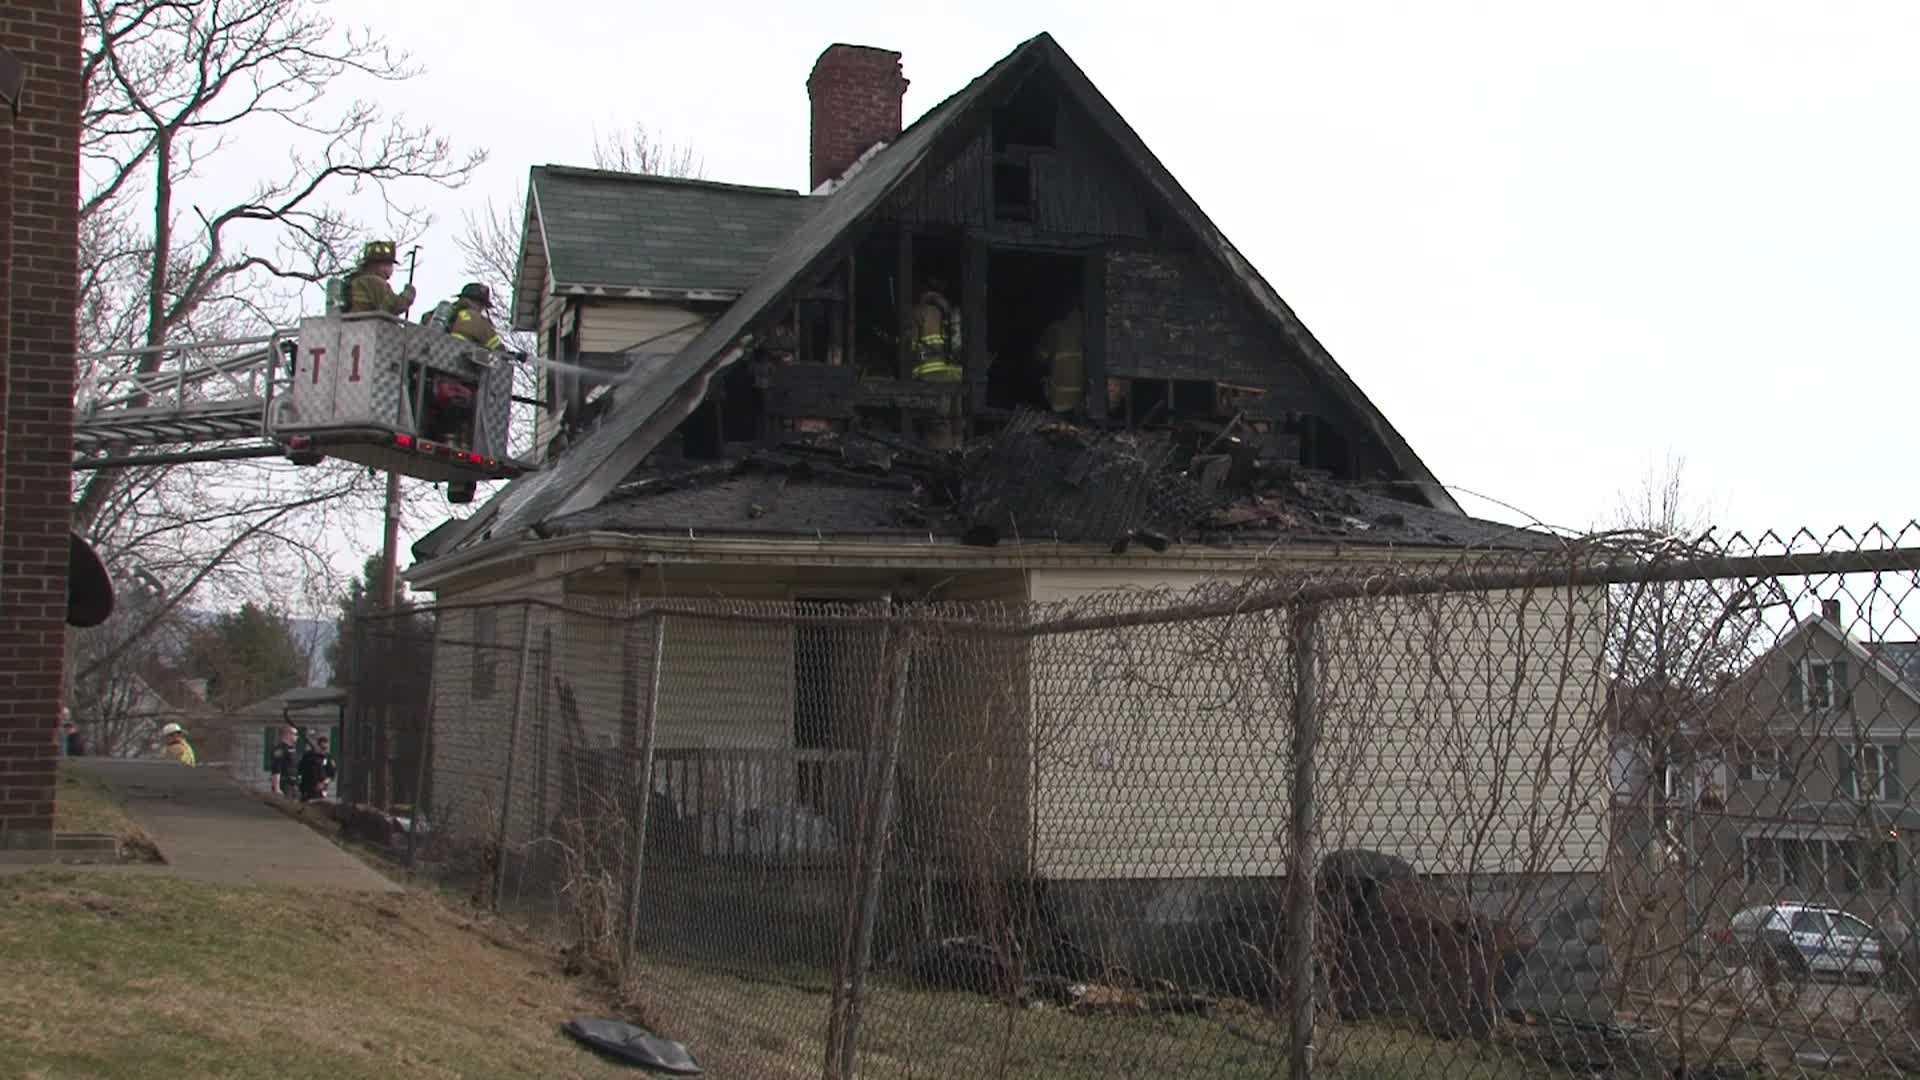 Uniontown house fire (no caption)